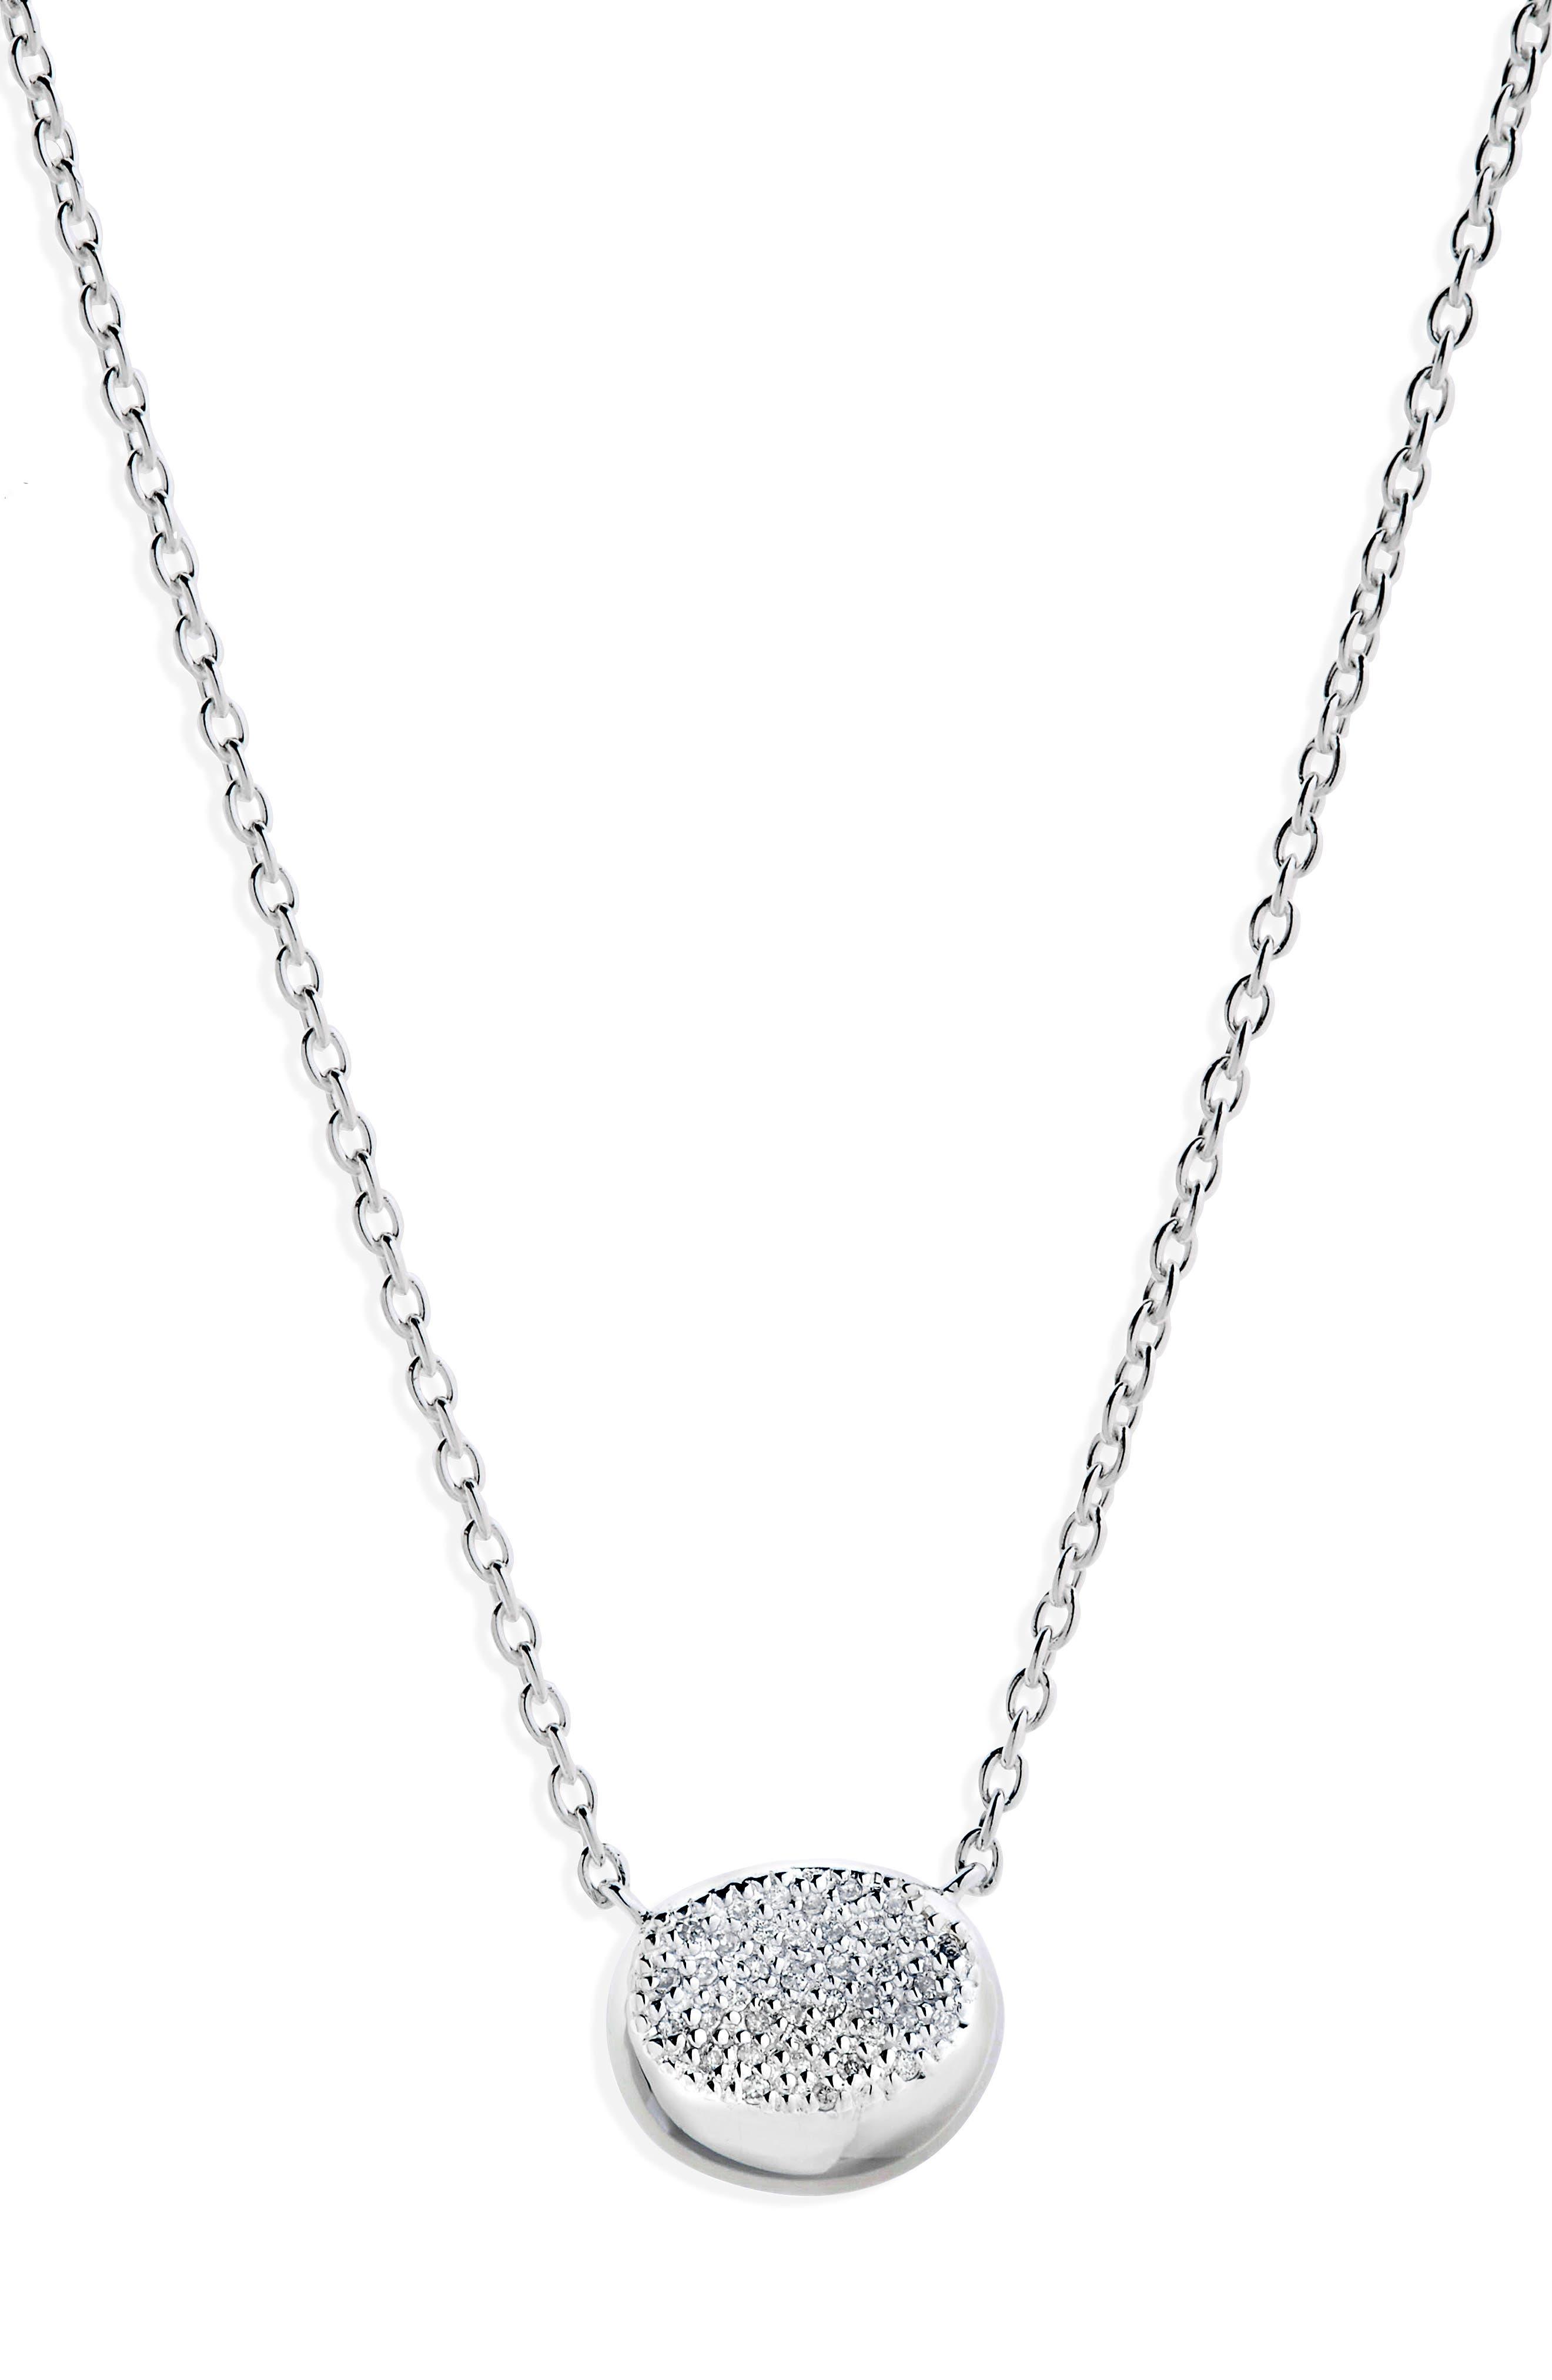 Onda Diamond Pendant Necklace,                             Main thumbnail 1, color,                             040